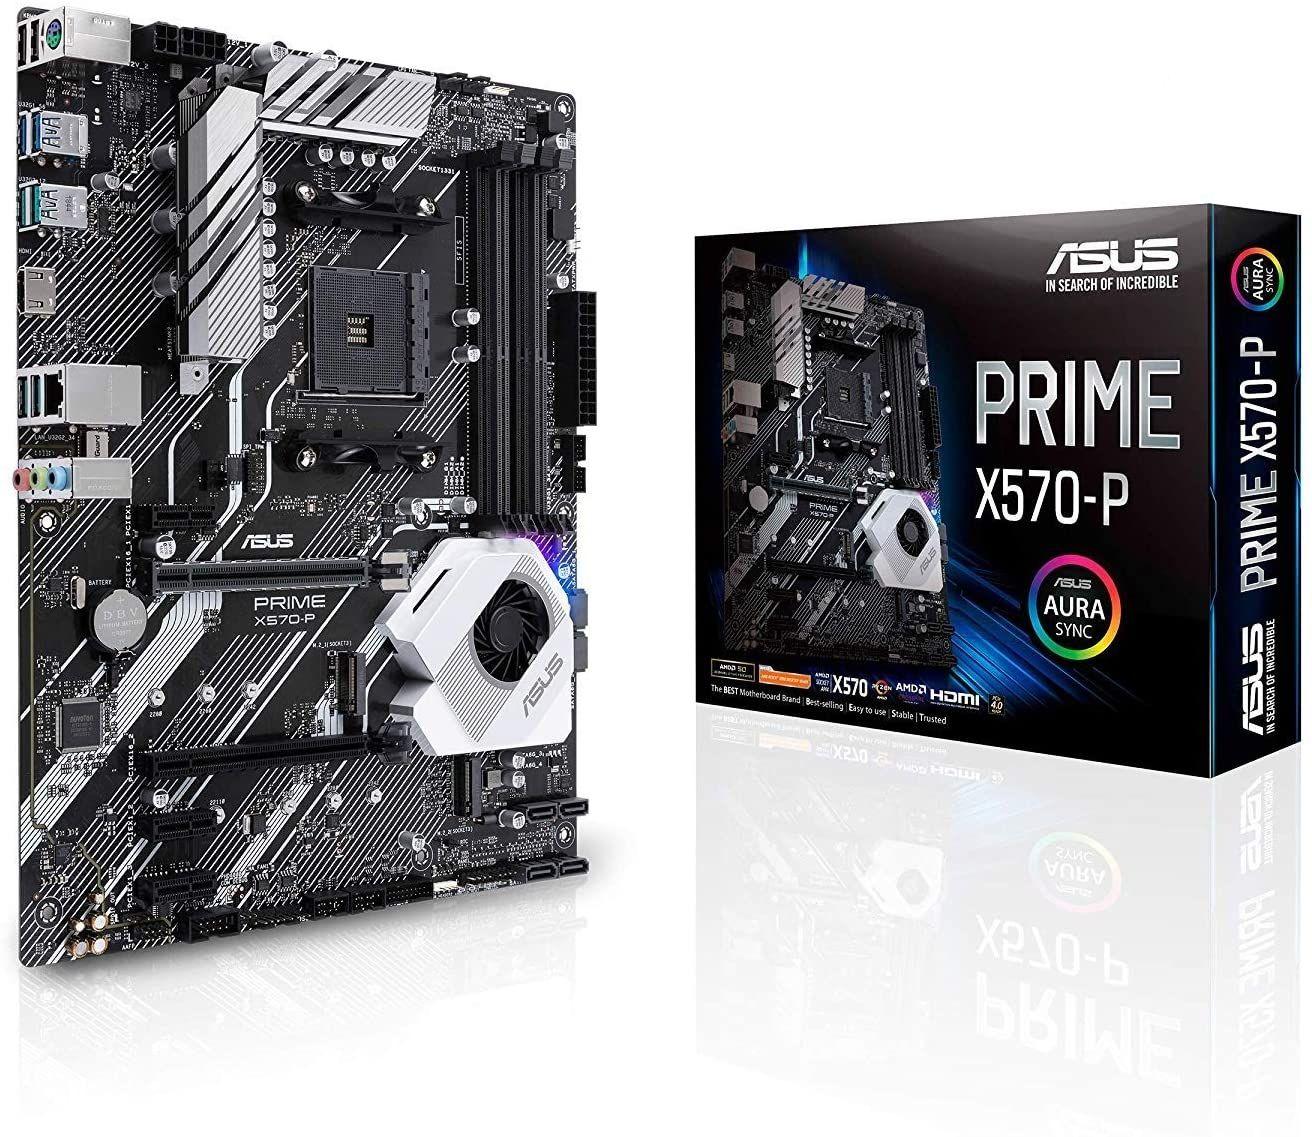 ASUS Prime X570-P Mainboard Sockel AM4 (Ryzen 3000 kompatibel, ATX-, PCIe 4.0, DDR4, USB 3.2, Aura Sync)